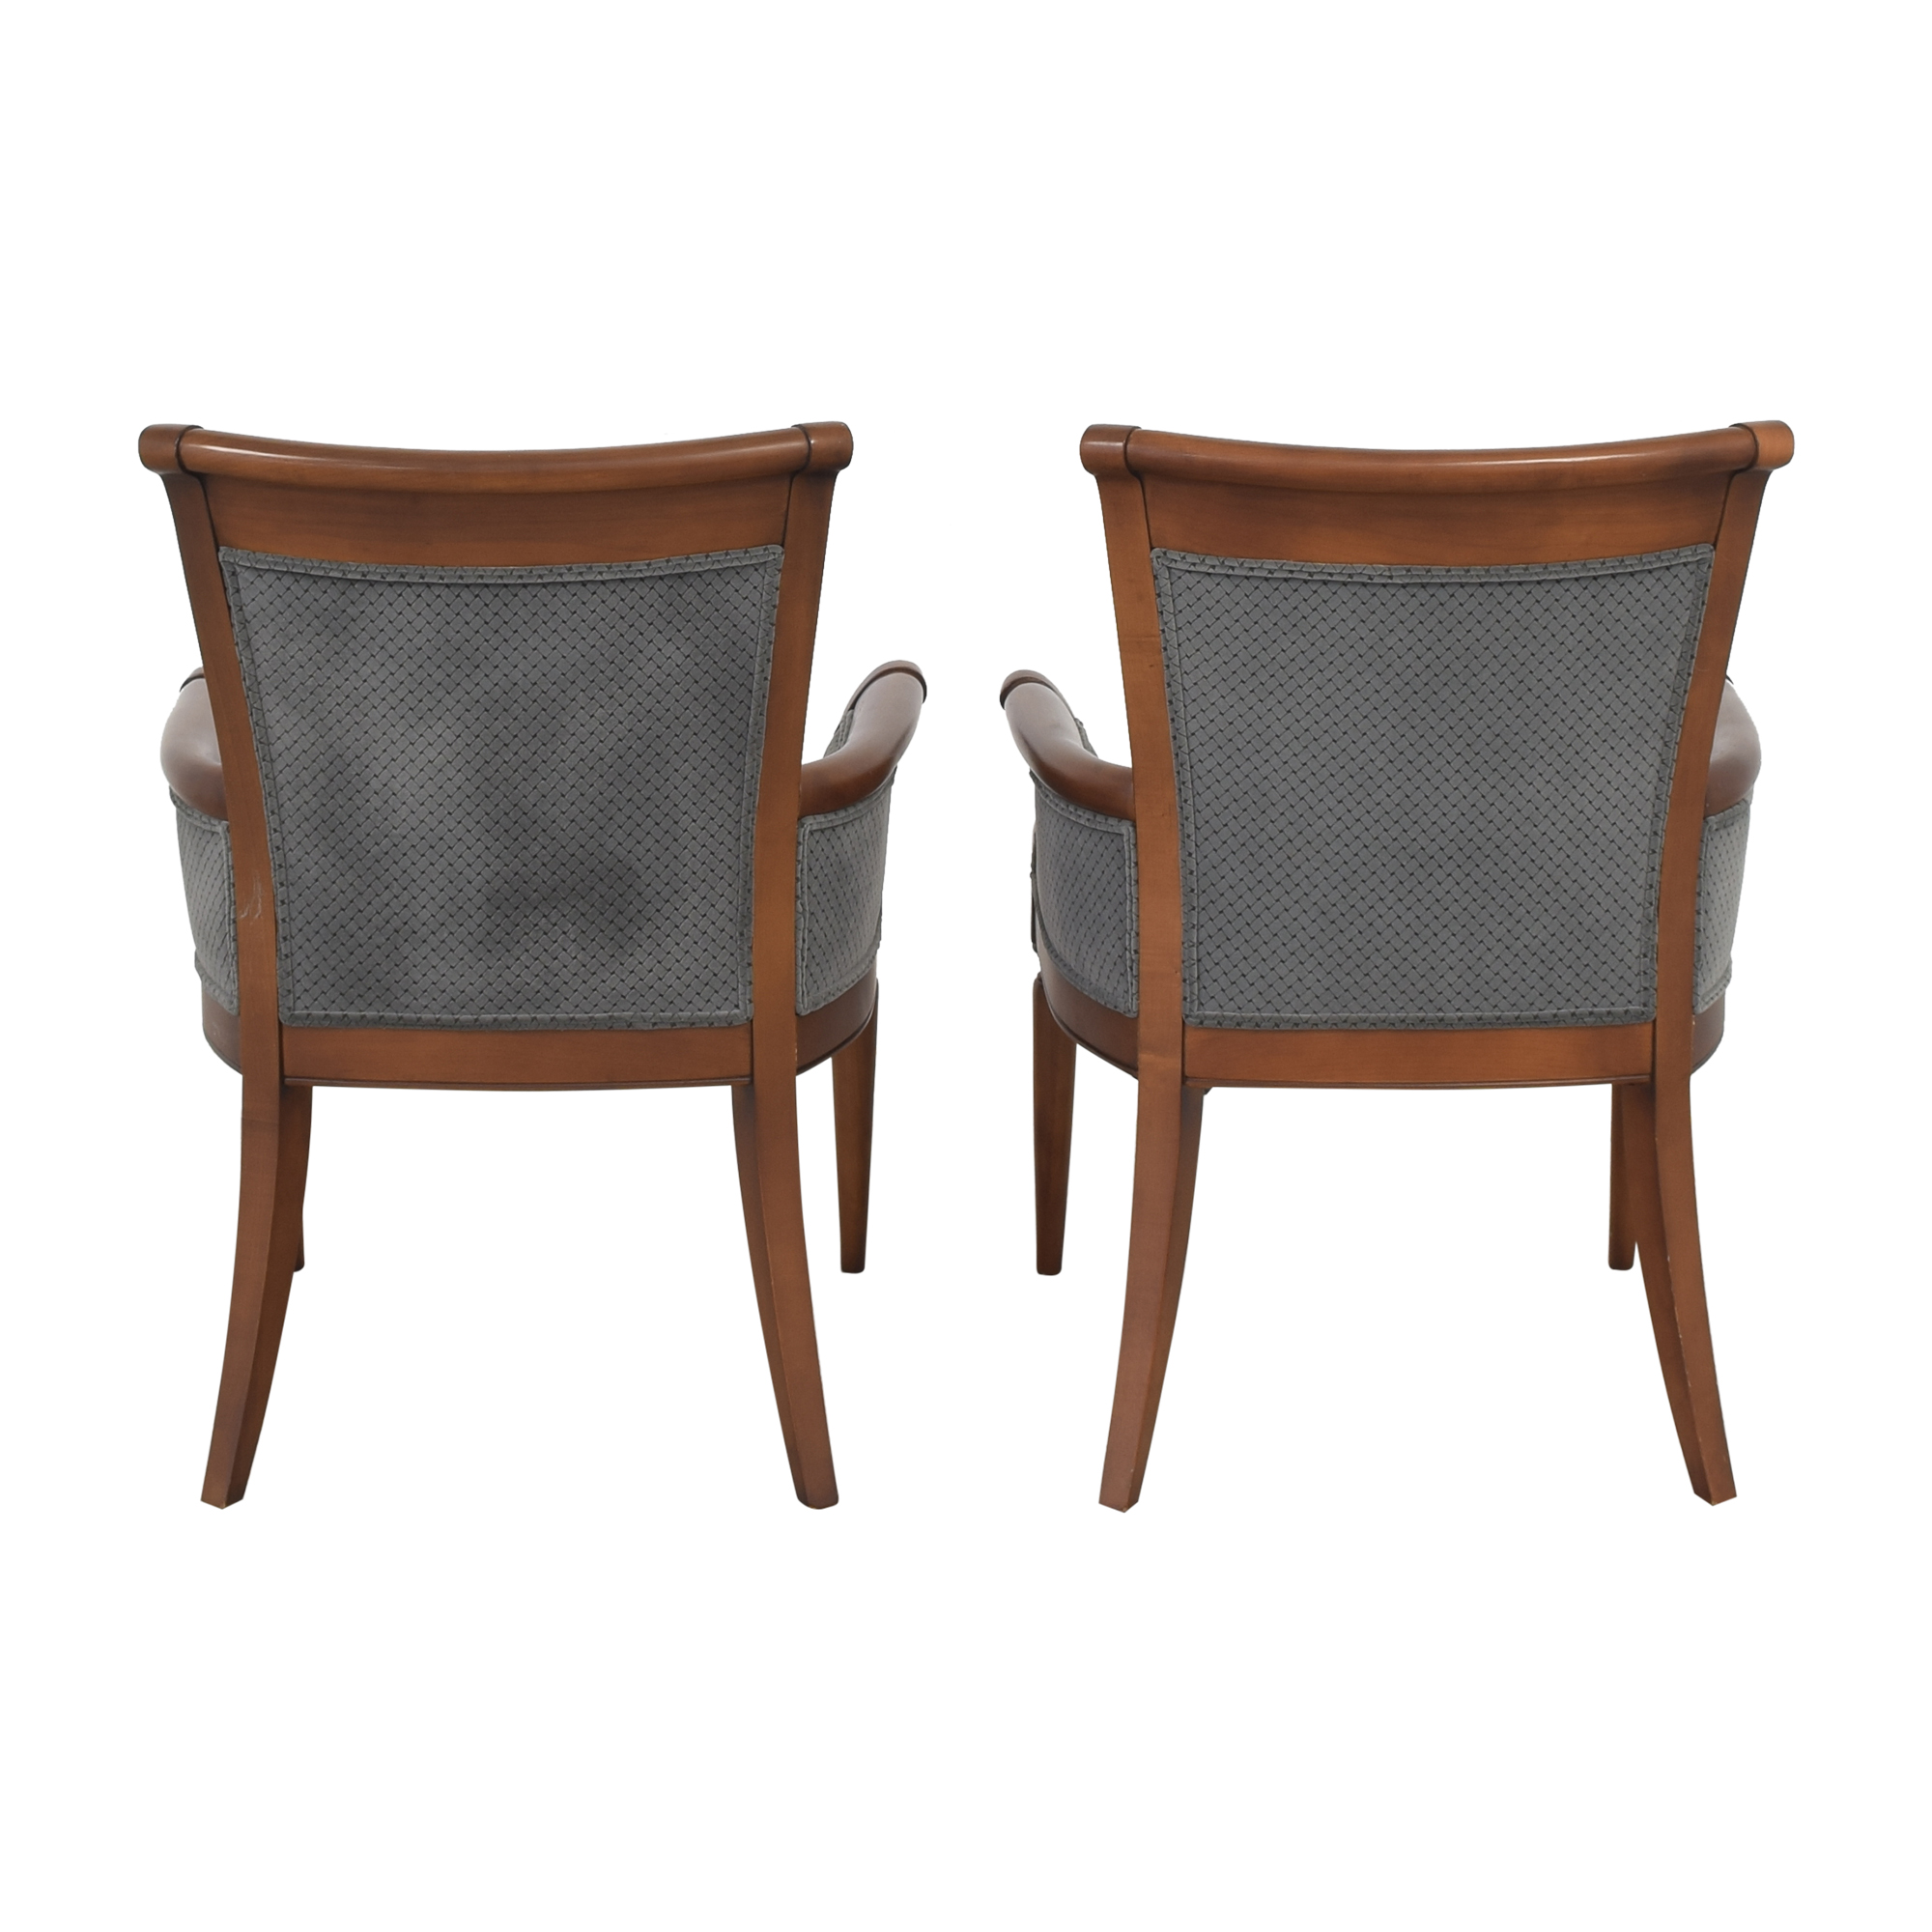 Hekman Furniture Hekman Aberdeen Accent Chairs nyc